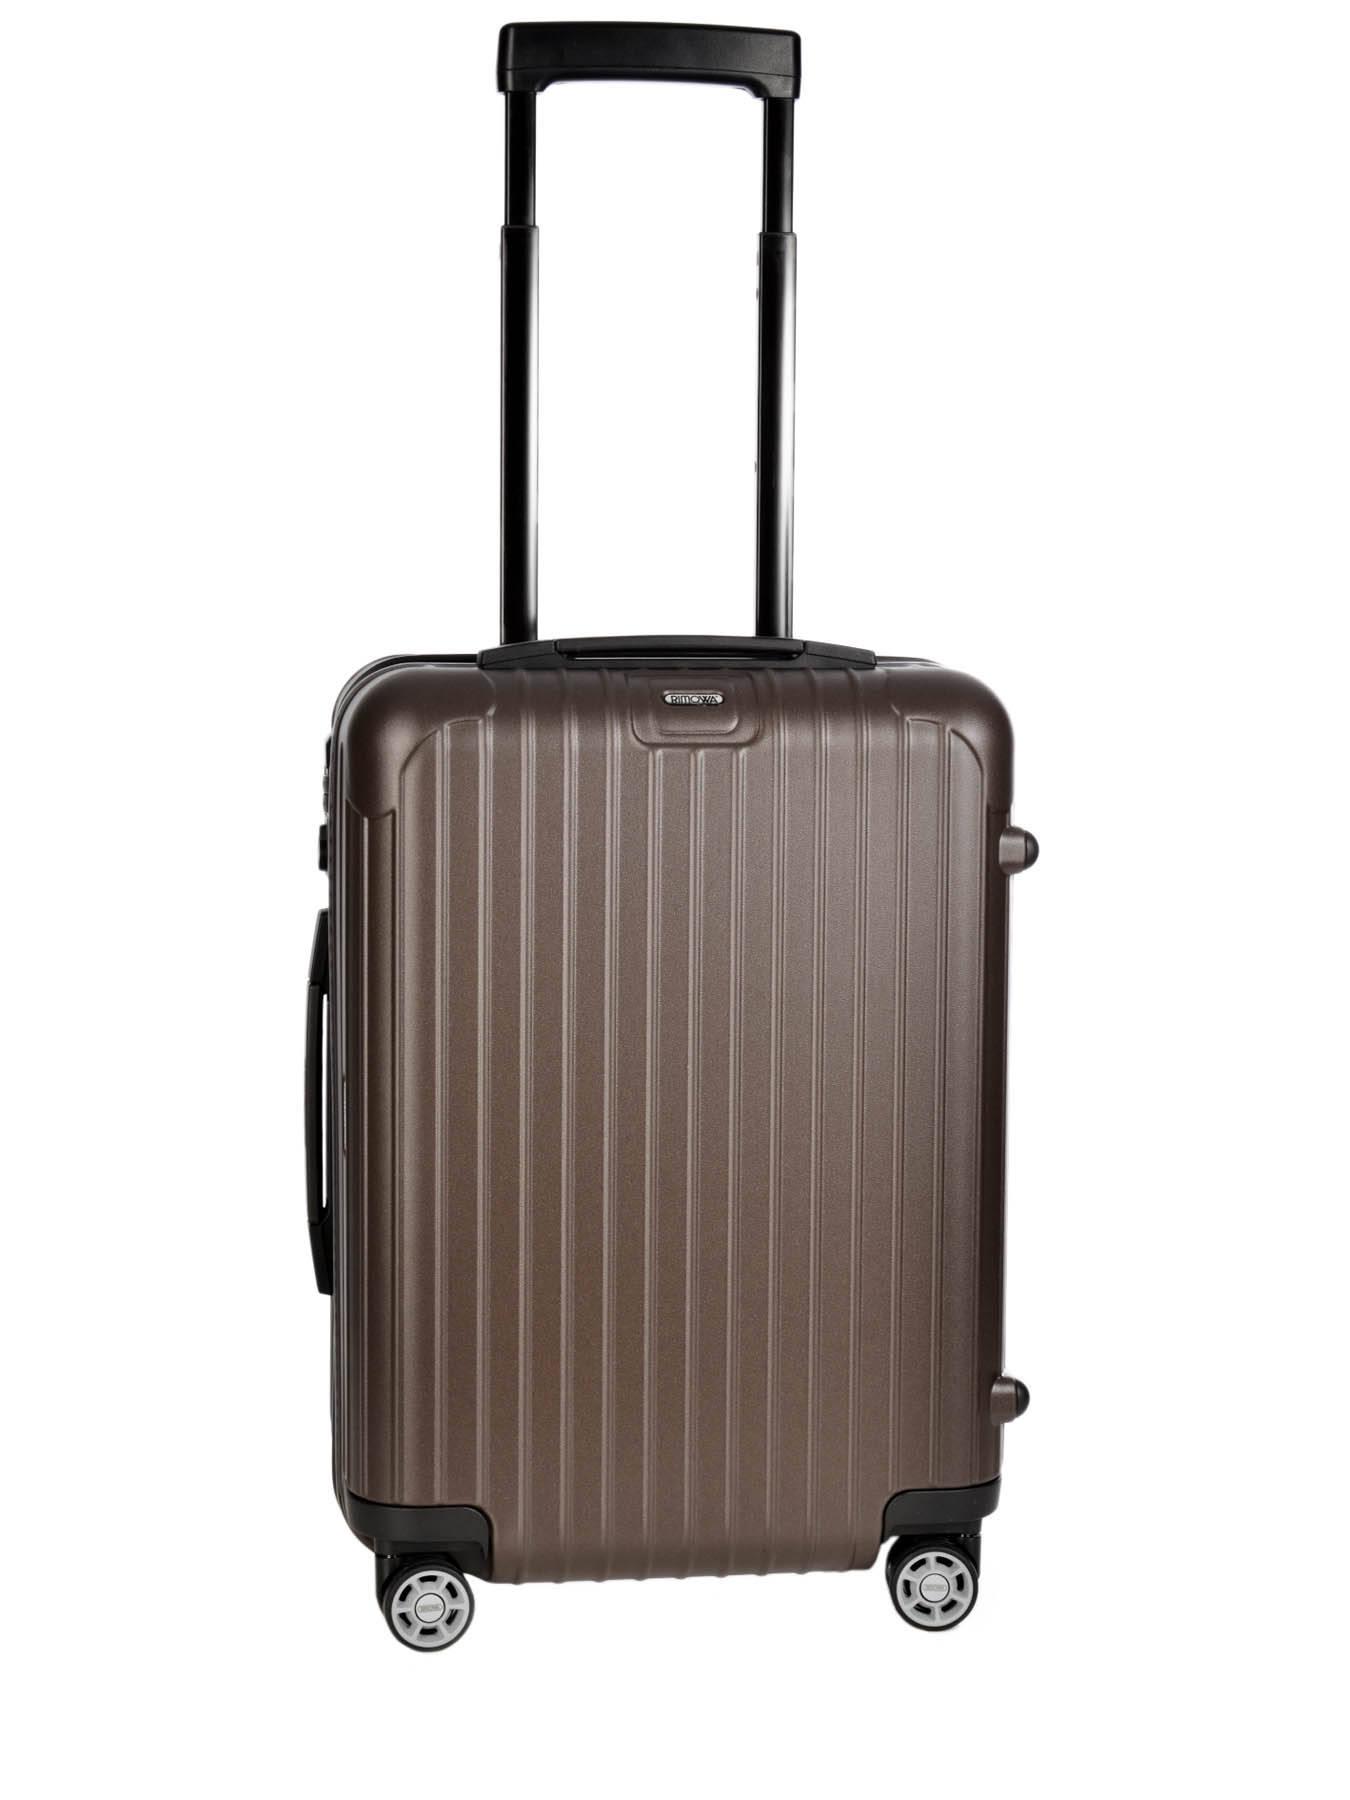 valise cabine rimowa salsa bronze en vente au meilleur prix. Black Bedroom Furniture Sets. Home Design Ideas